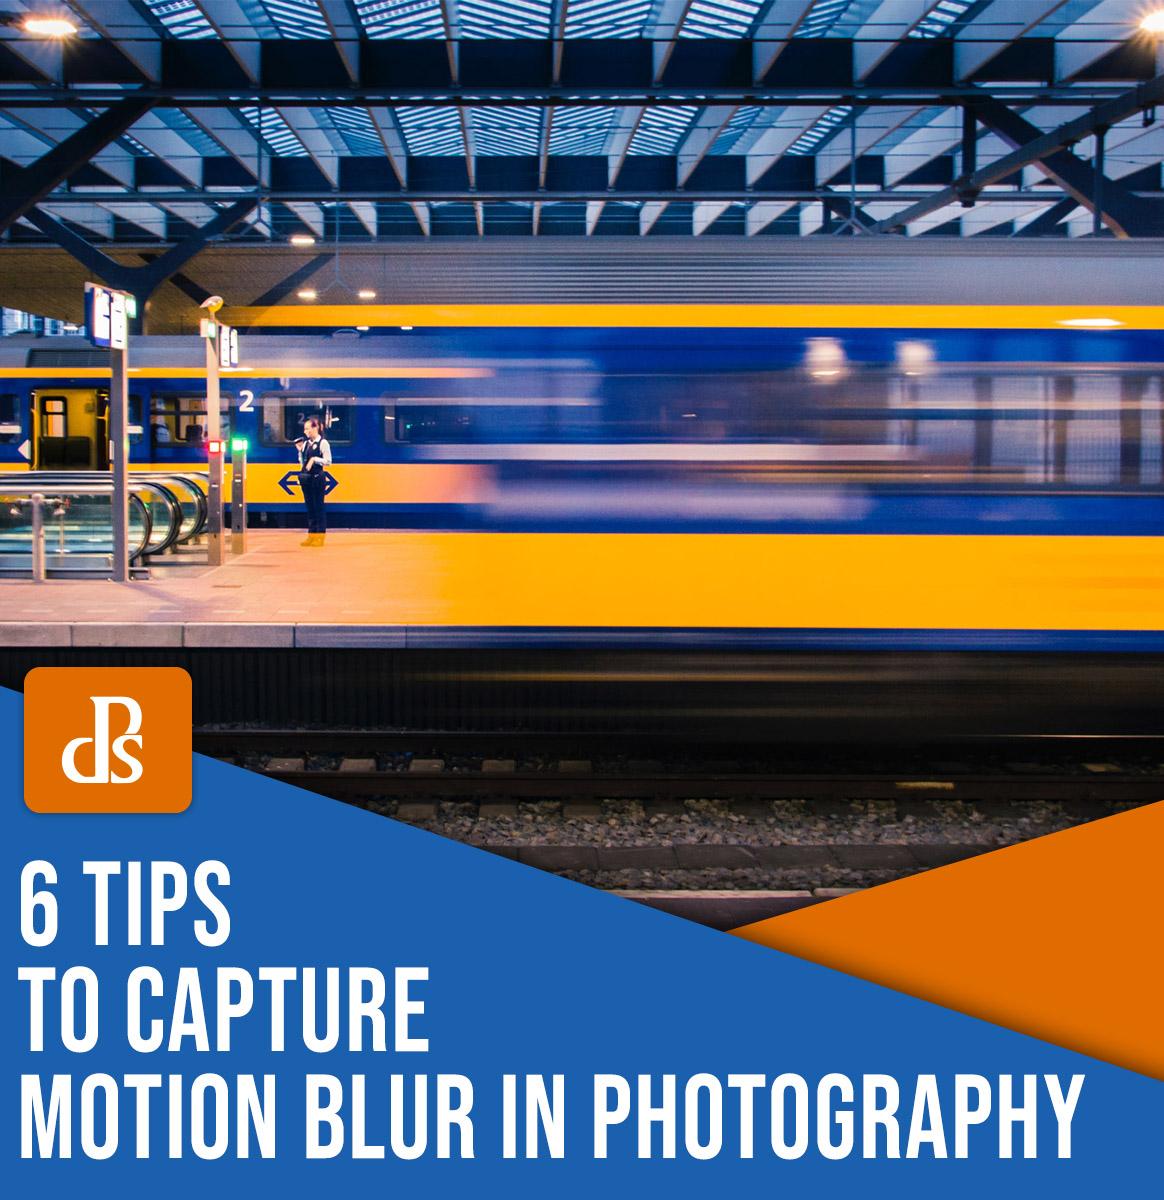 capture motion blur em fotografia